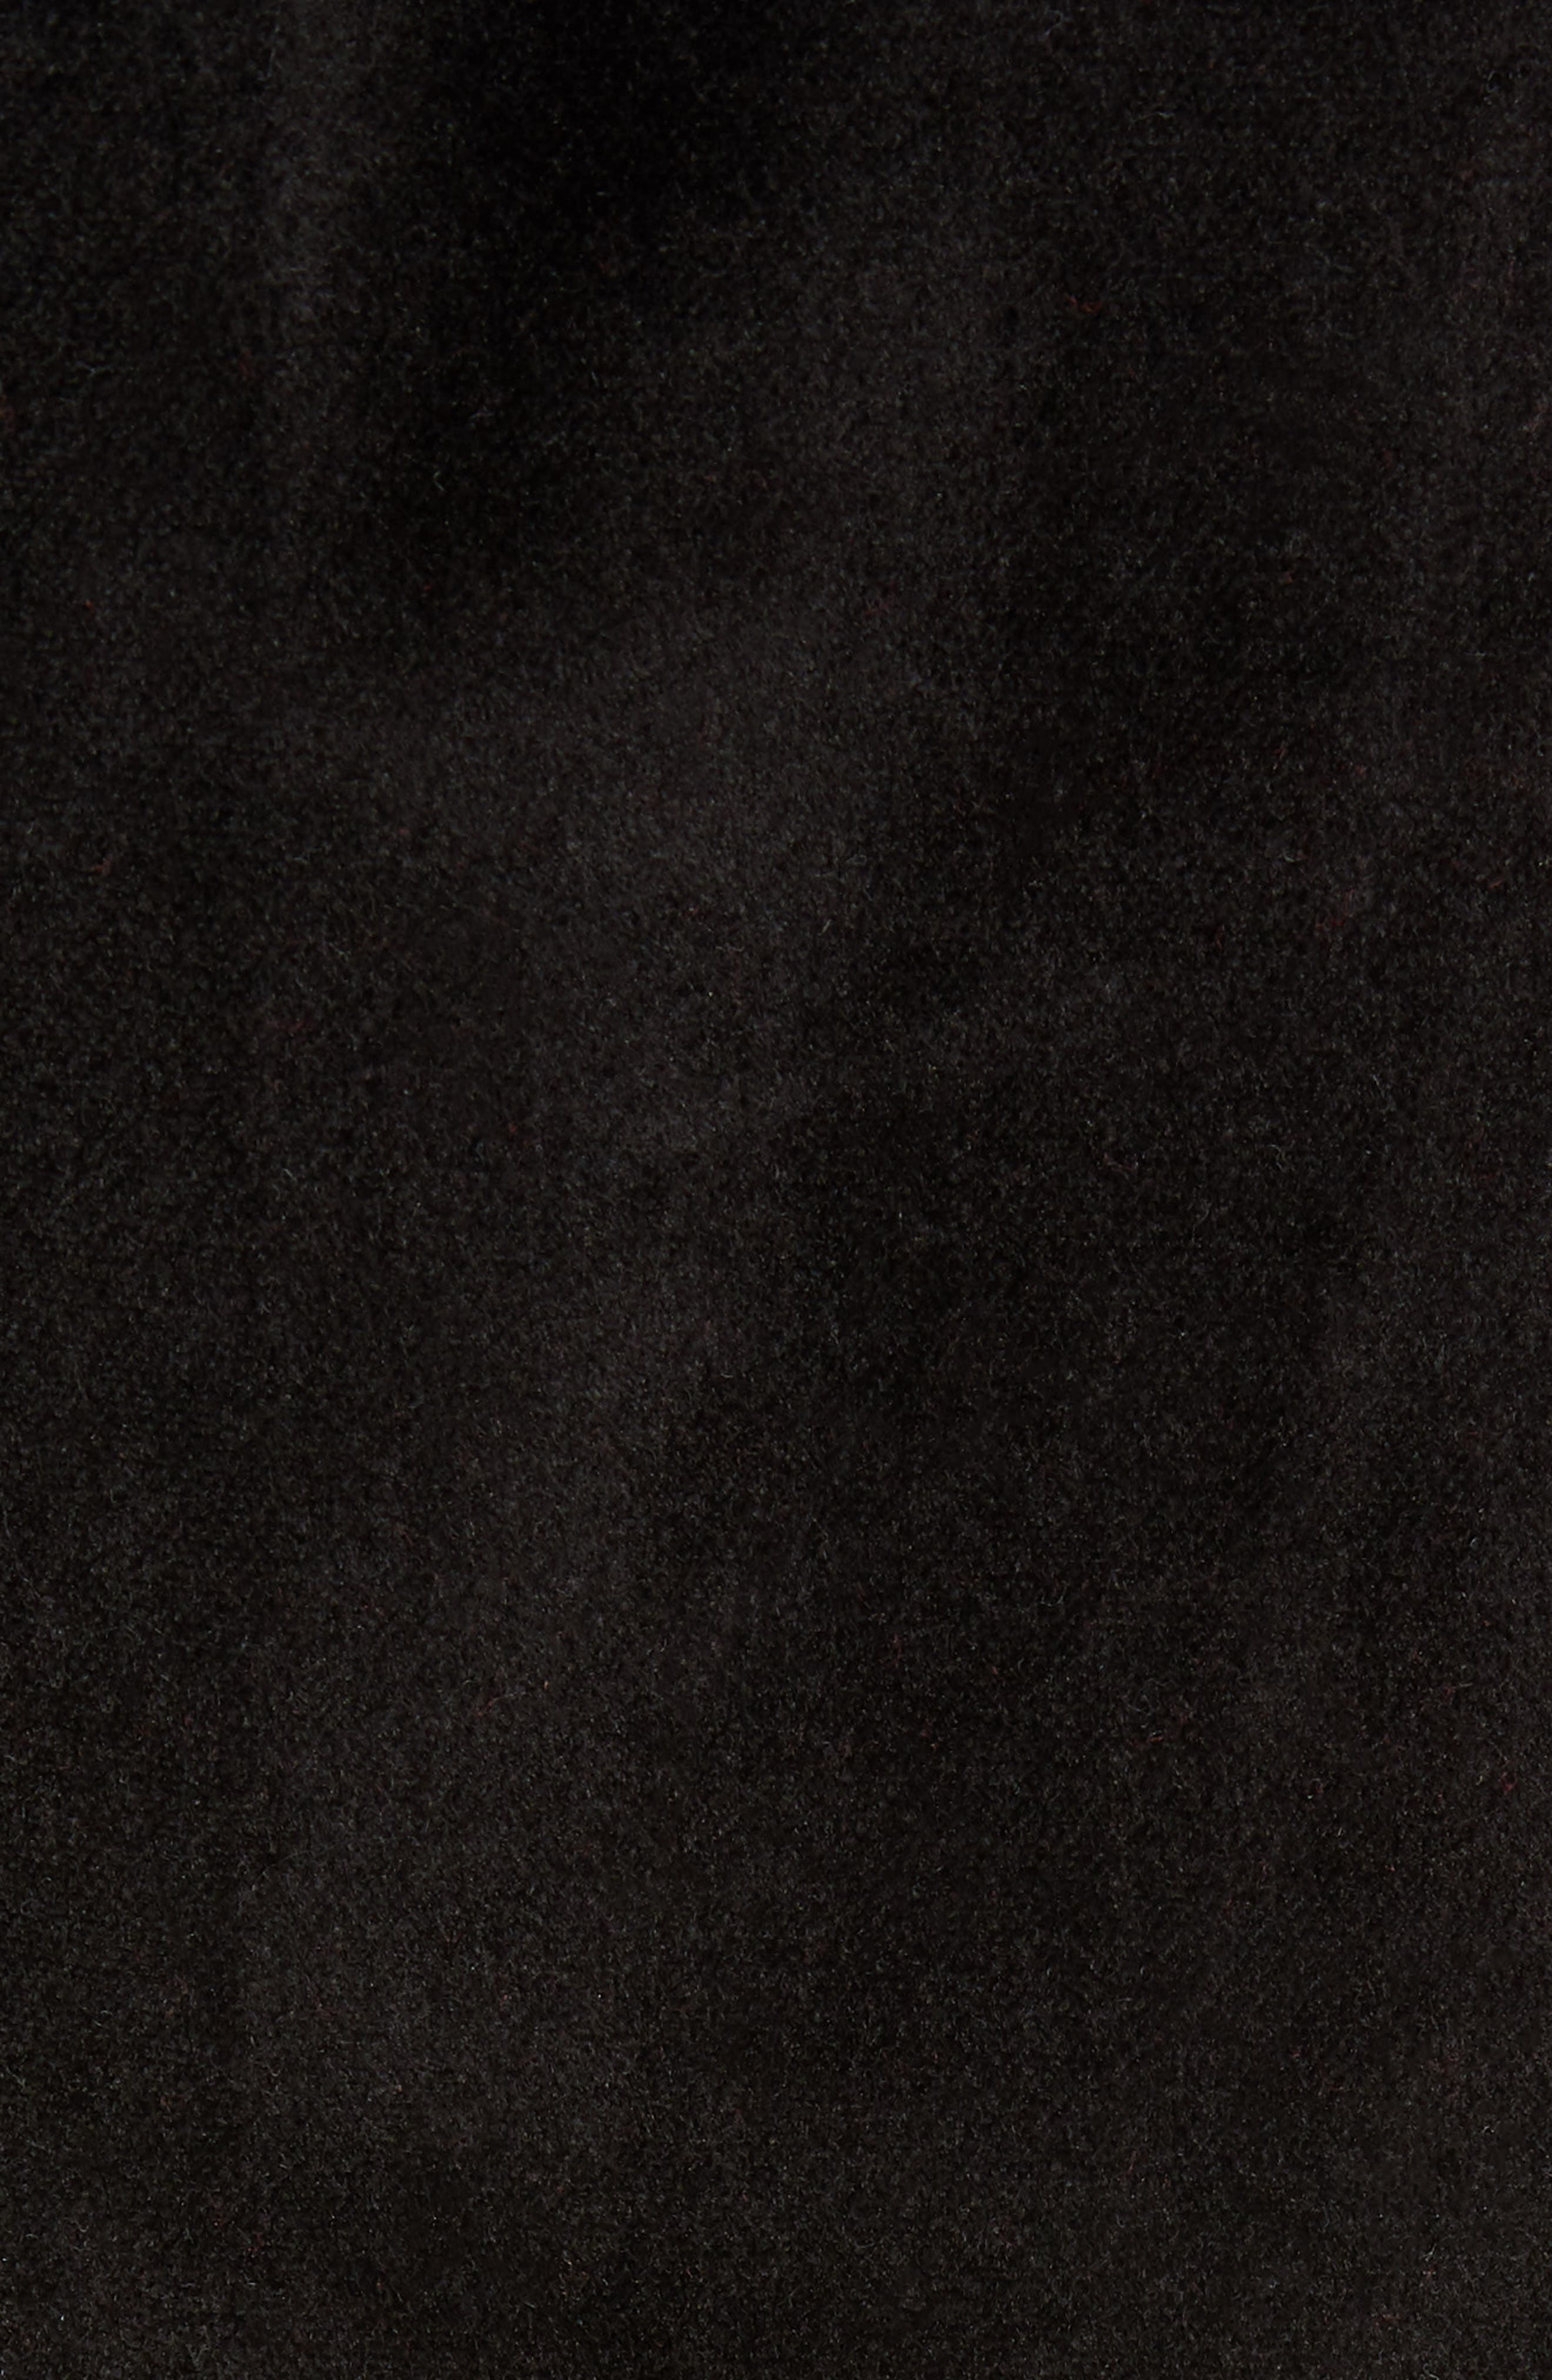 Authentic Serena Cotton Velour Track Pants,                             Alternate thumbnail 5, color,                             BLACK/ RED/ GREY